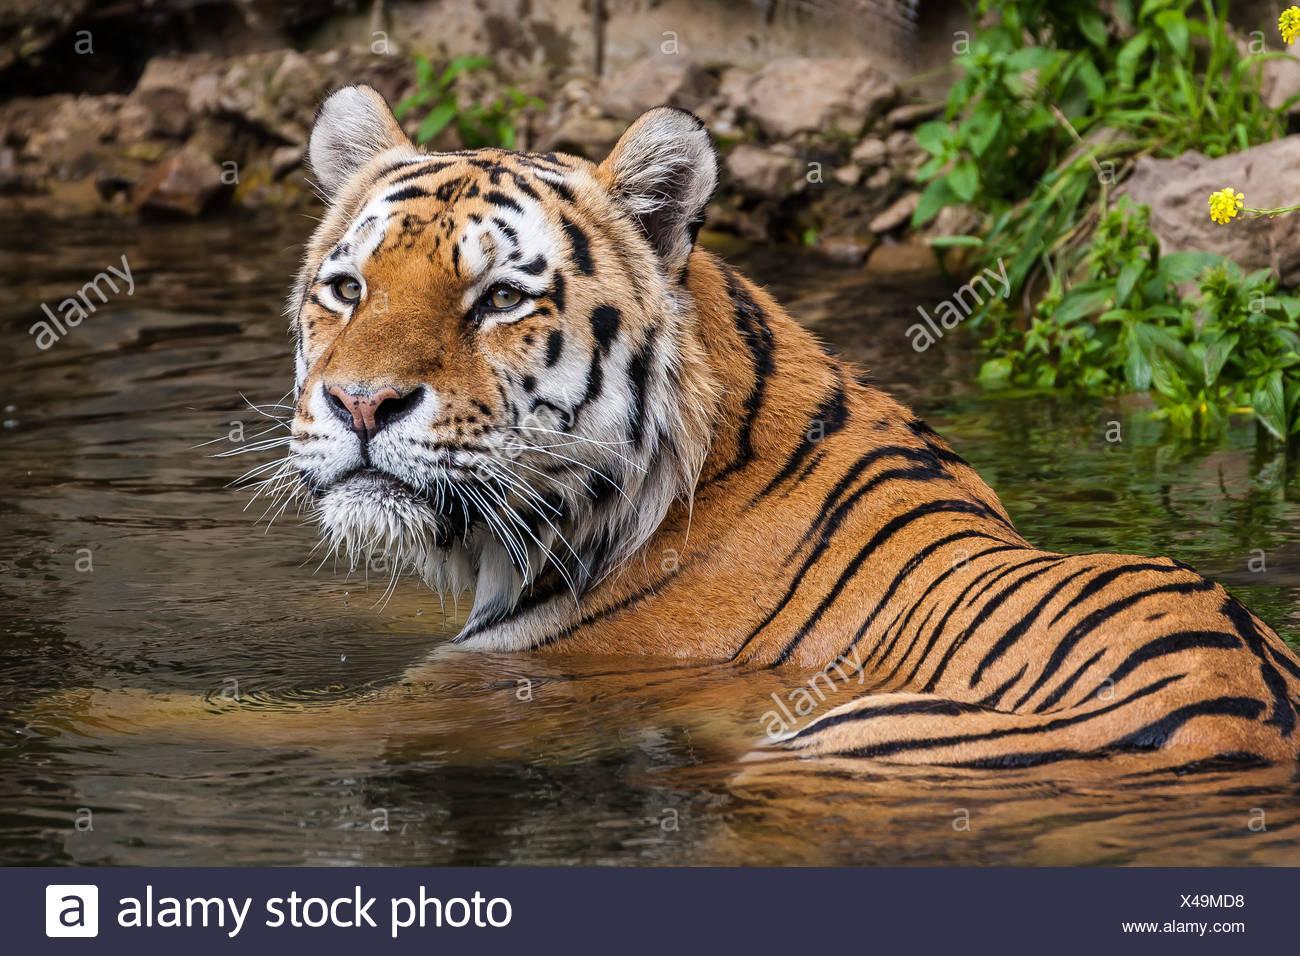 animal, mammal, big cat, feline predator, cat, tiger, hunt, felinely, nature, Stock Photo